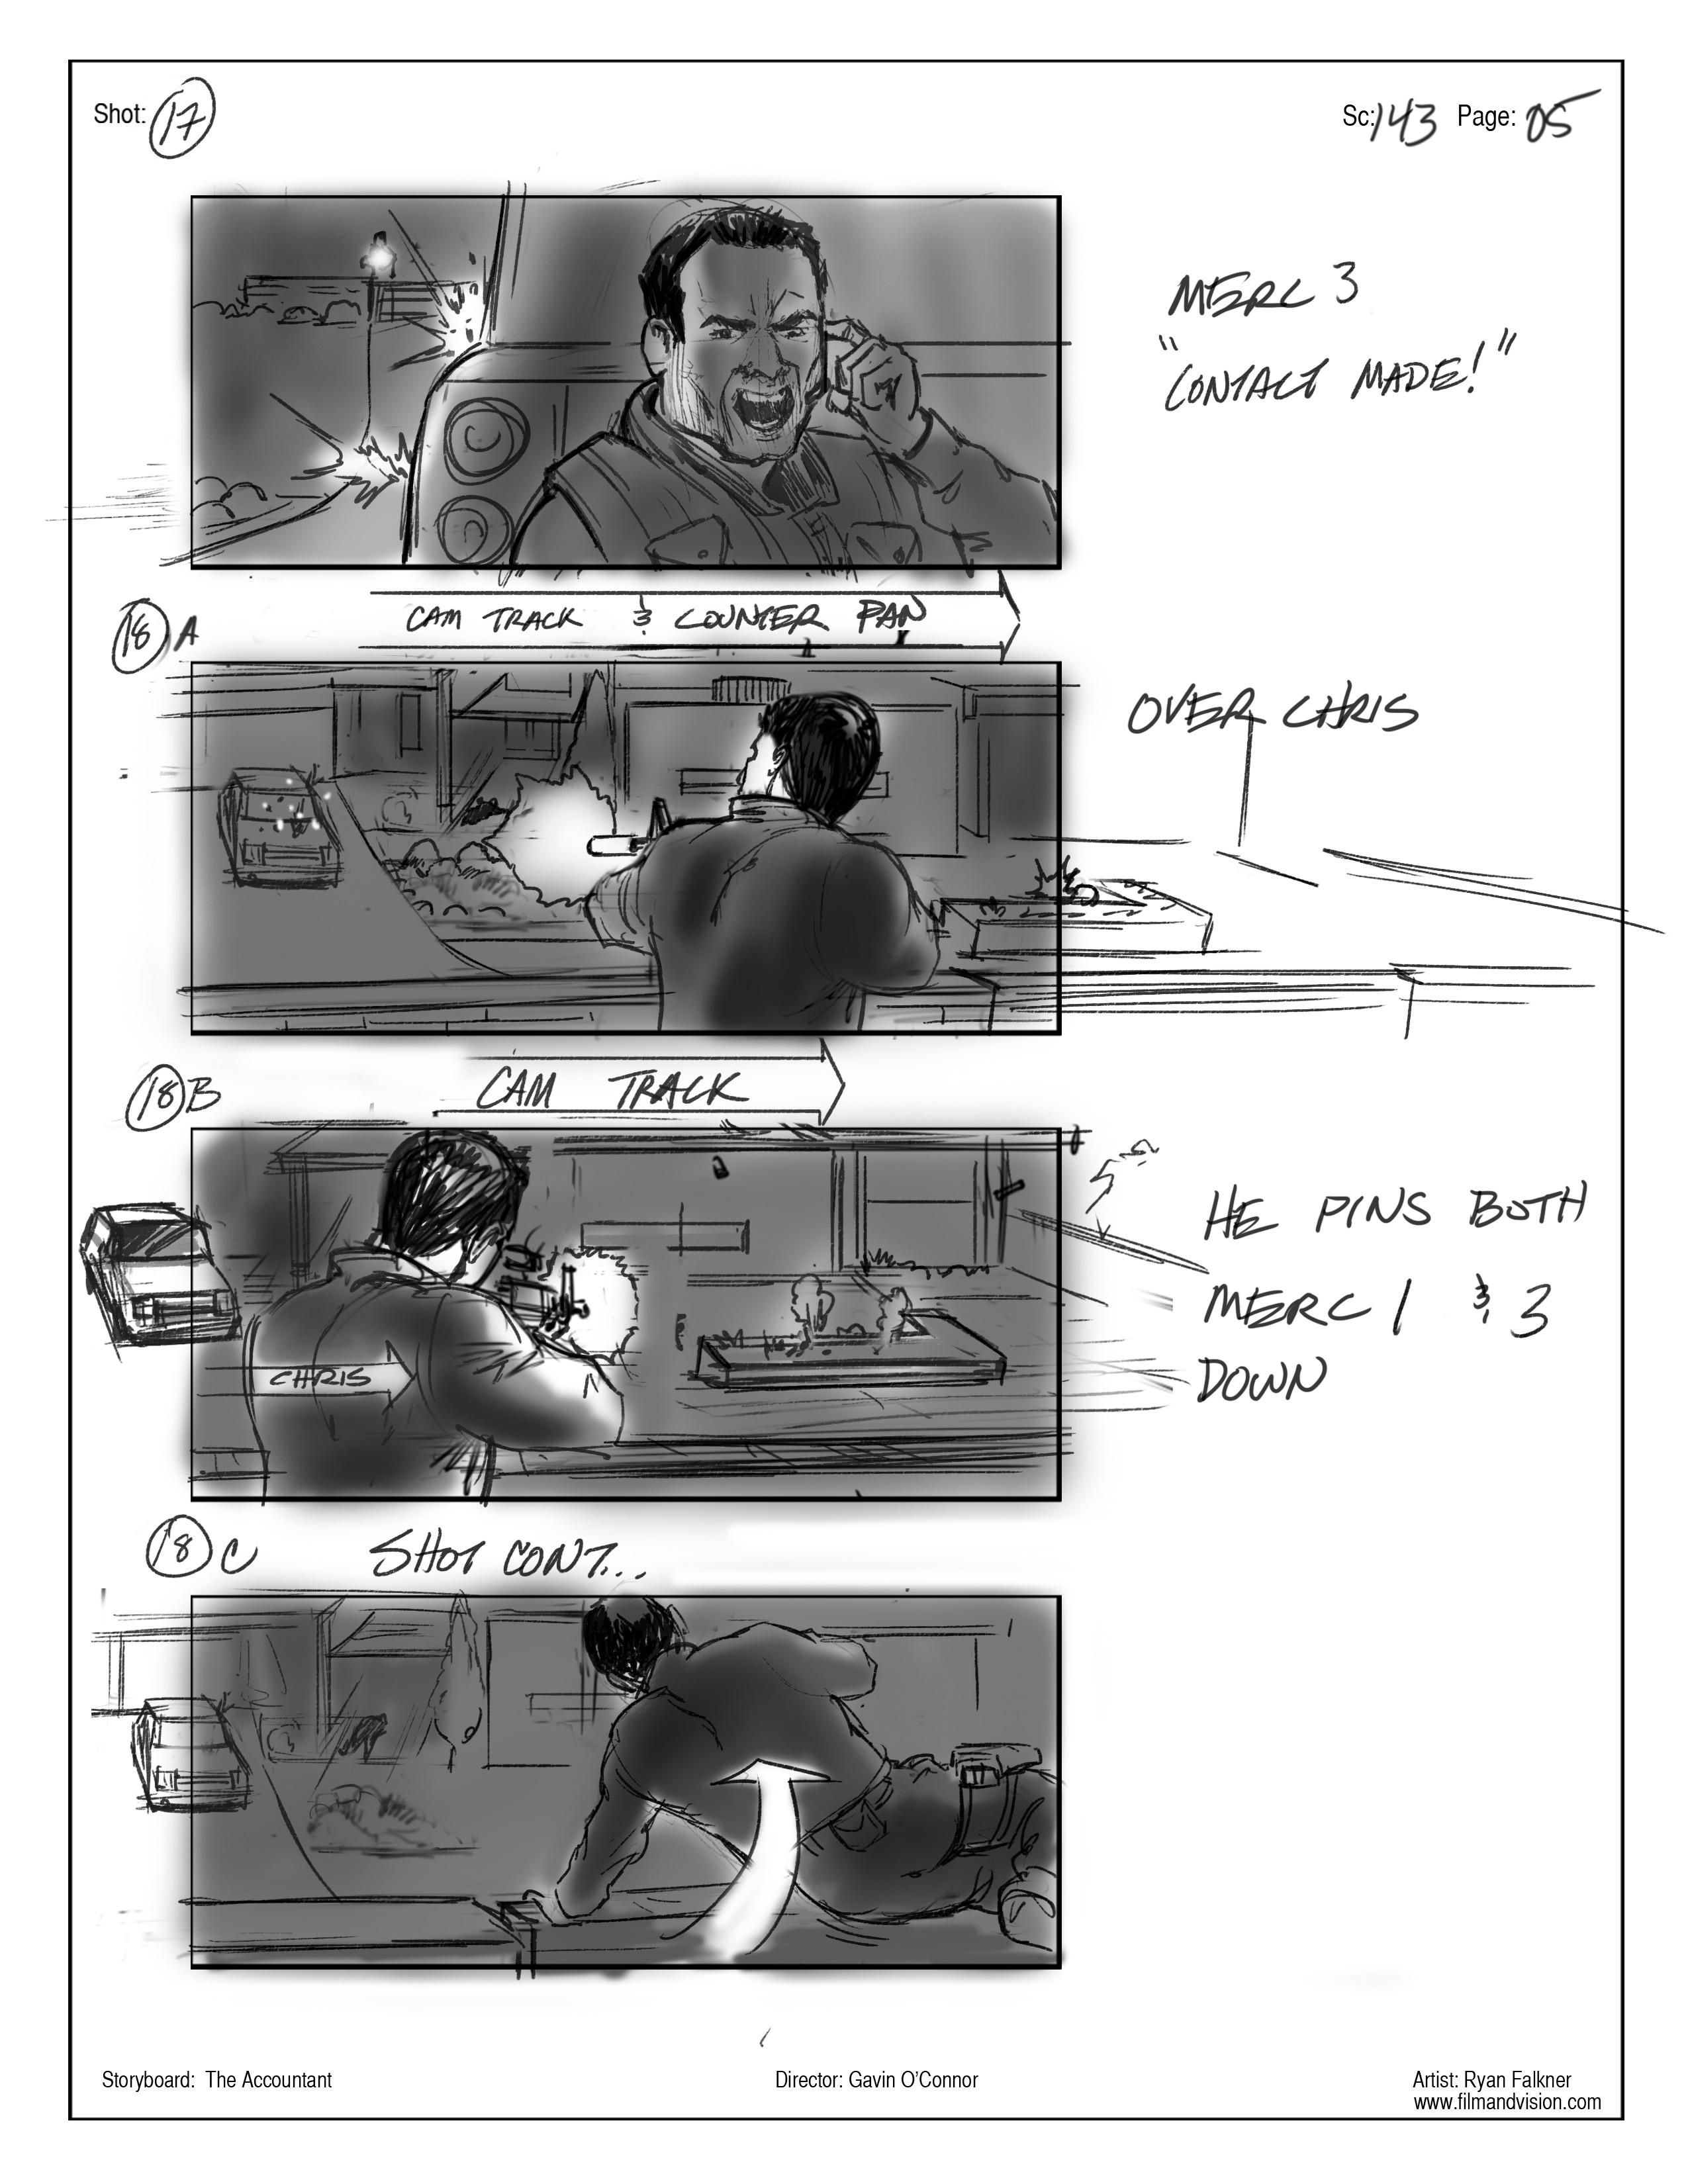 Sc.143_Lamar's_Board_V01_05